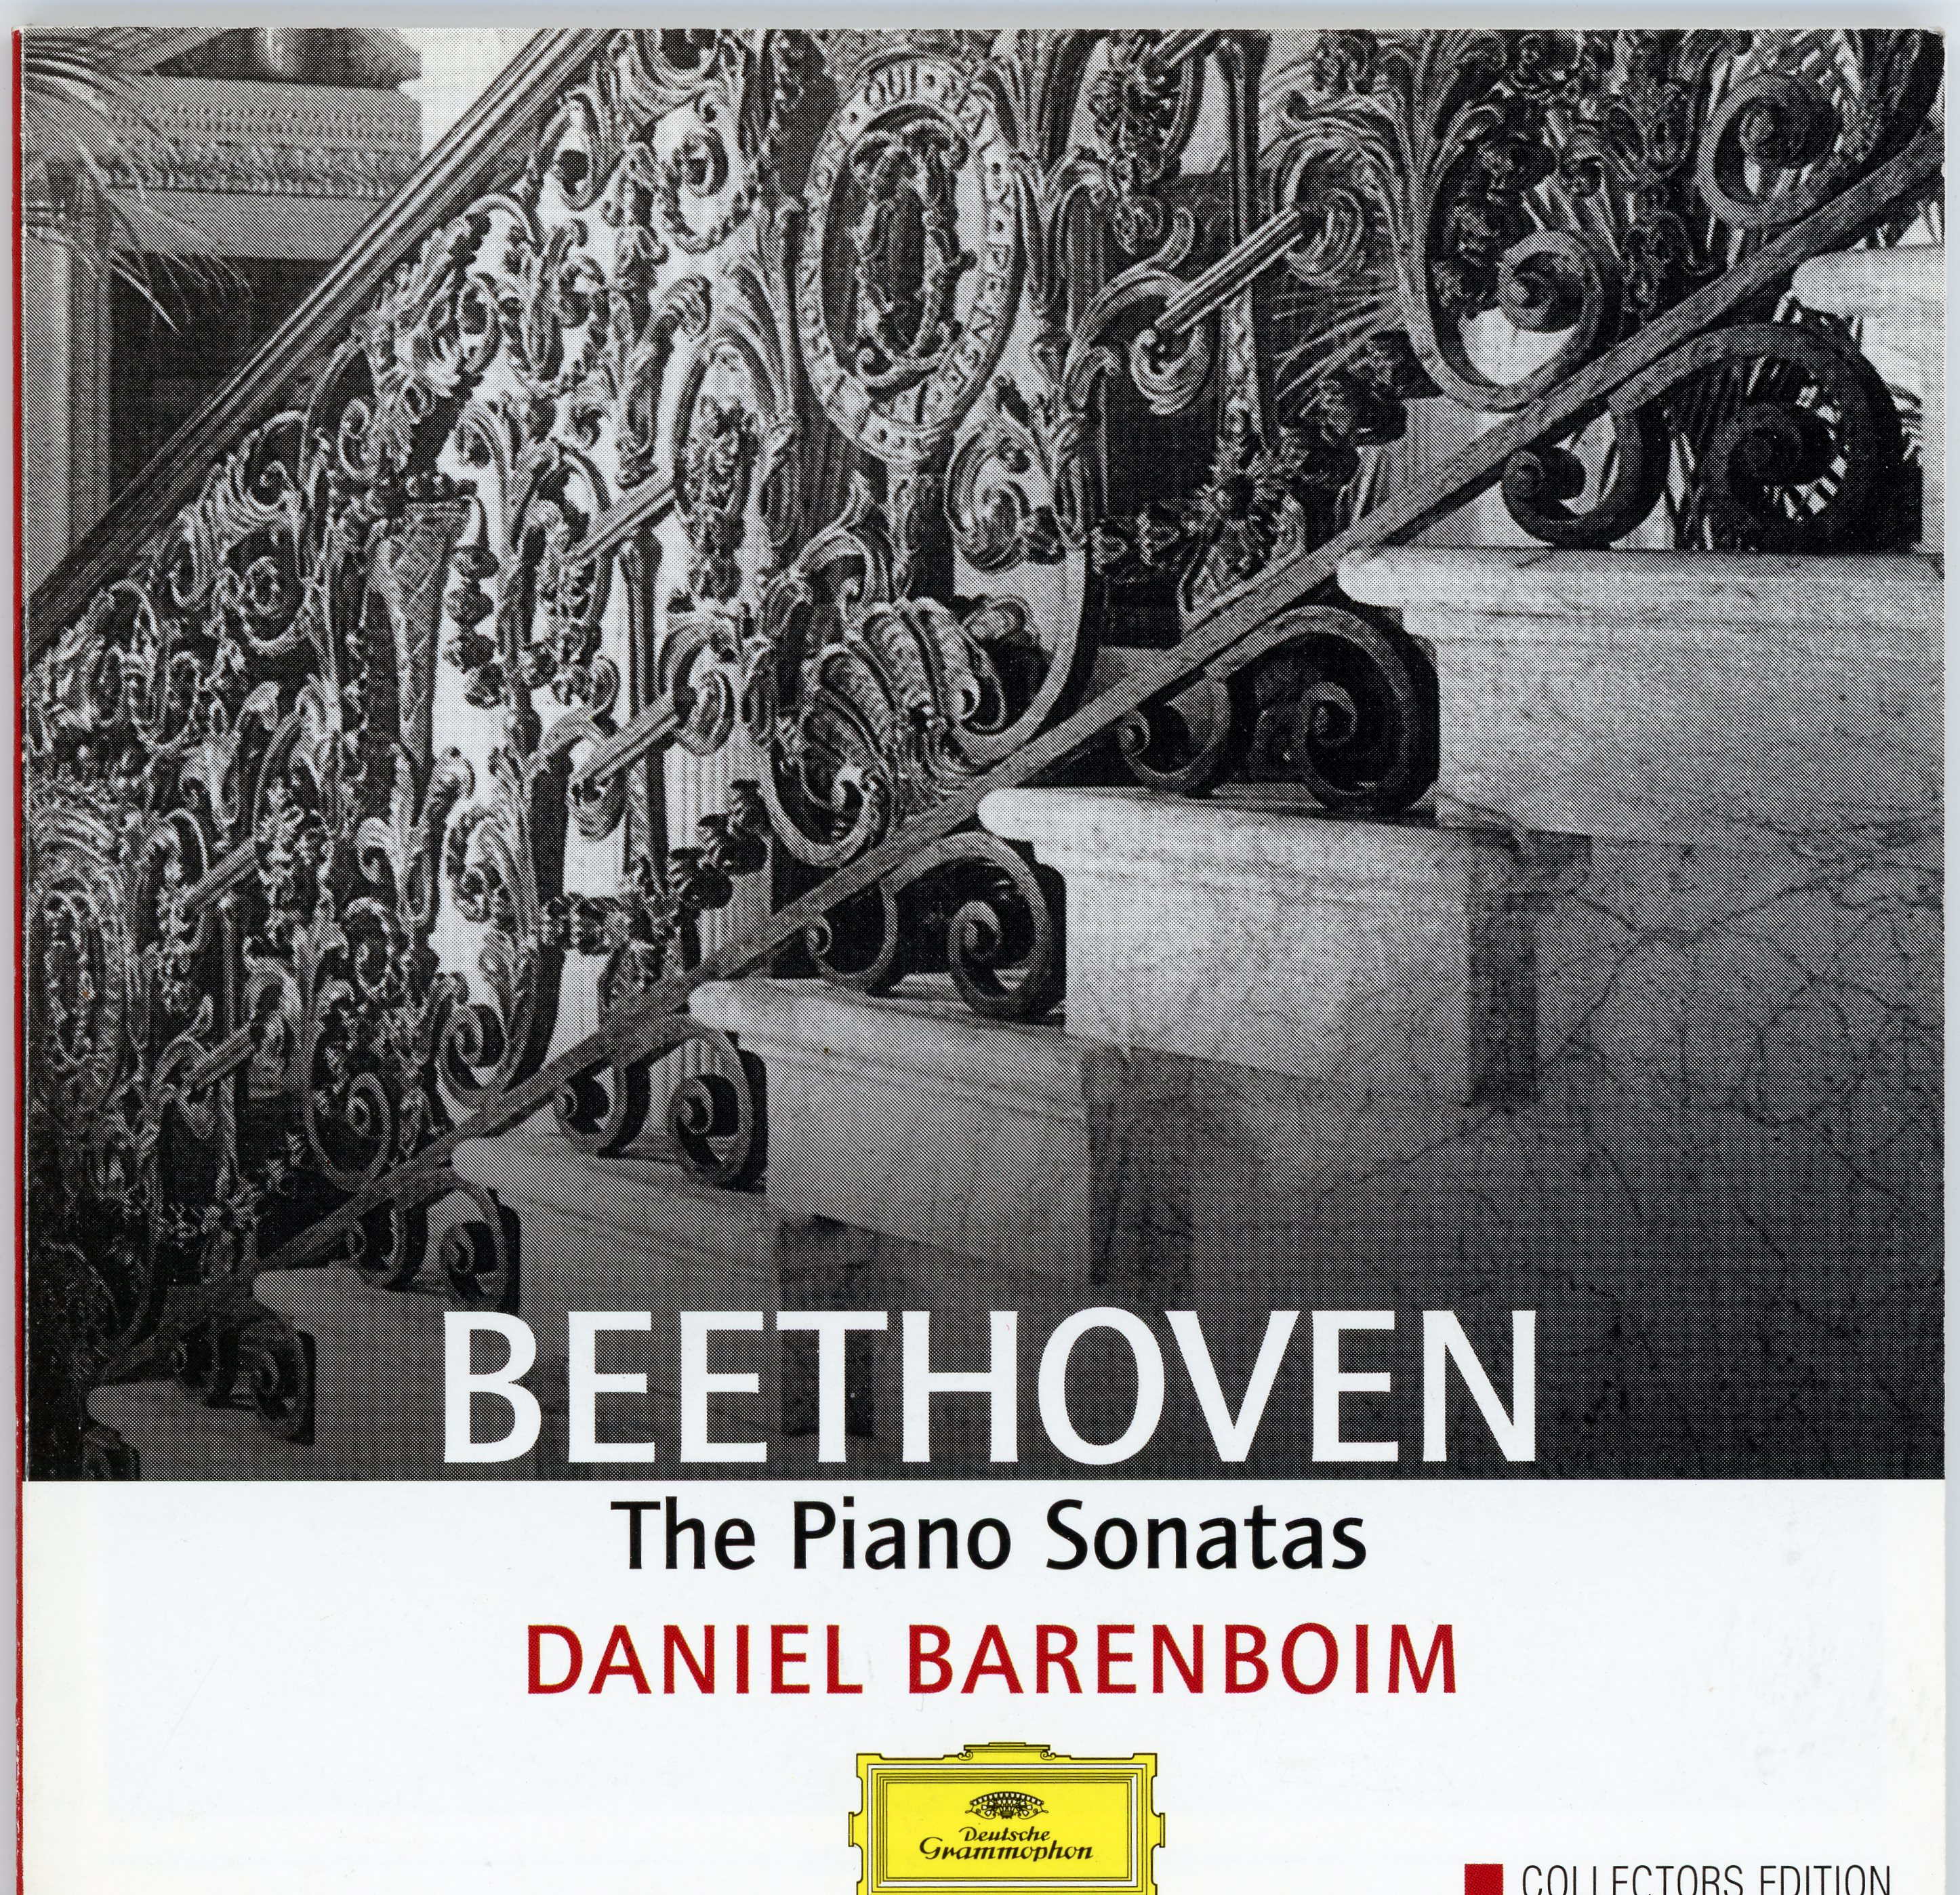 barenboim-sonatas-beethoven-segundo-ciclo